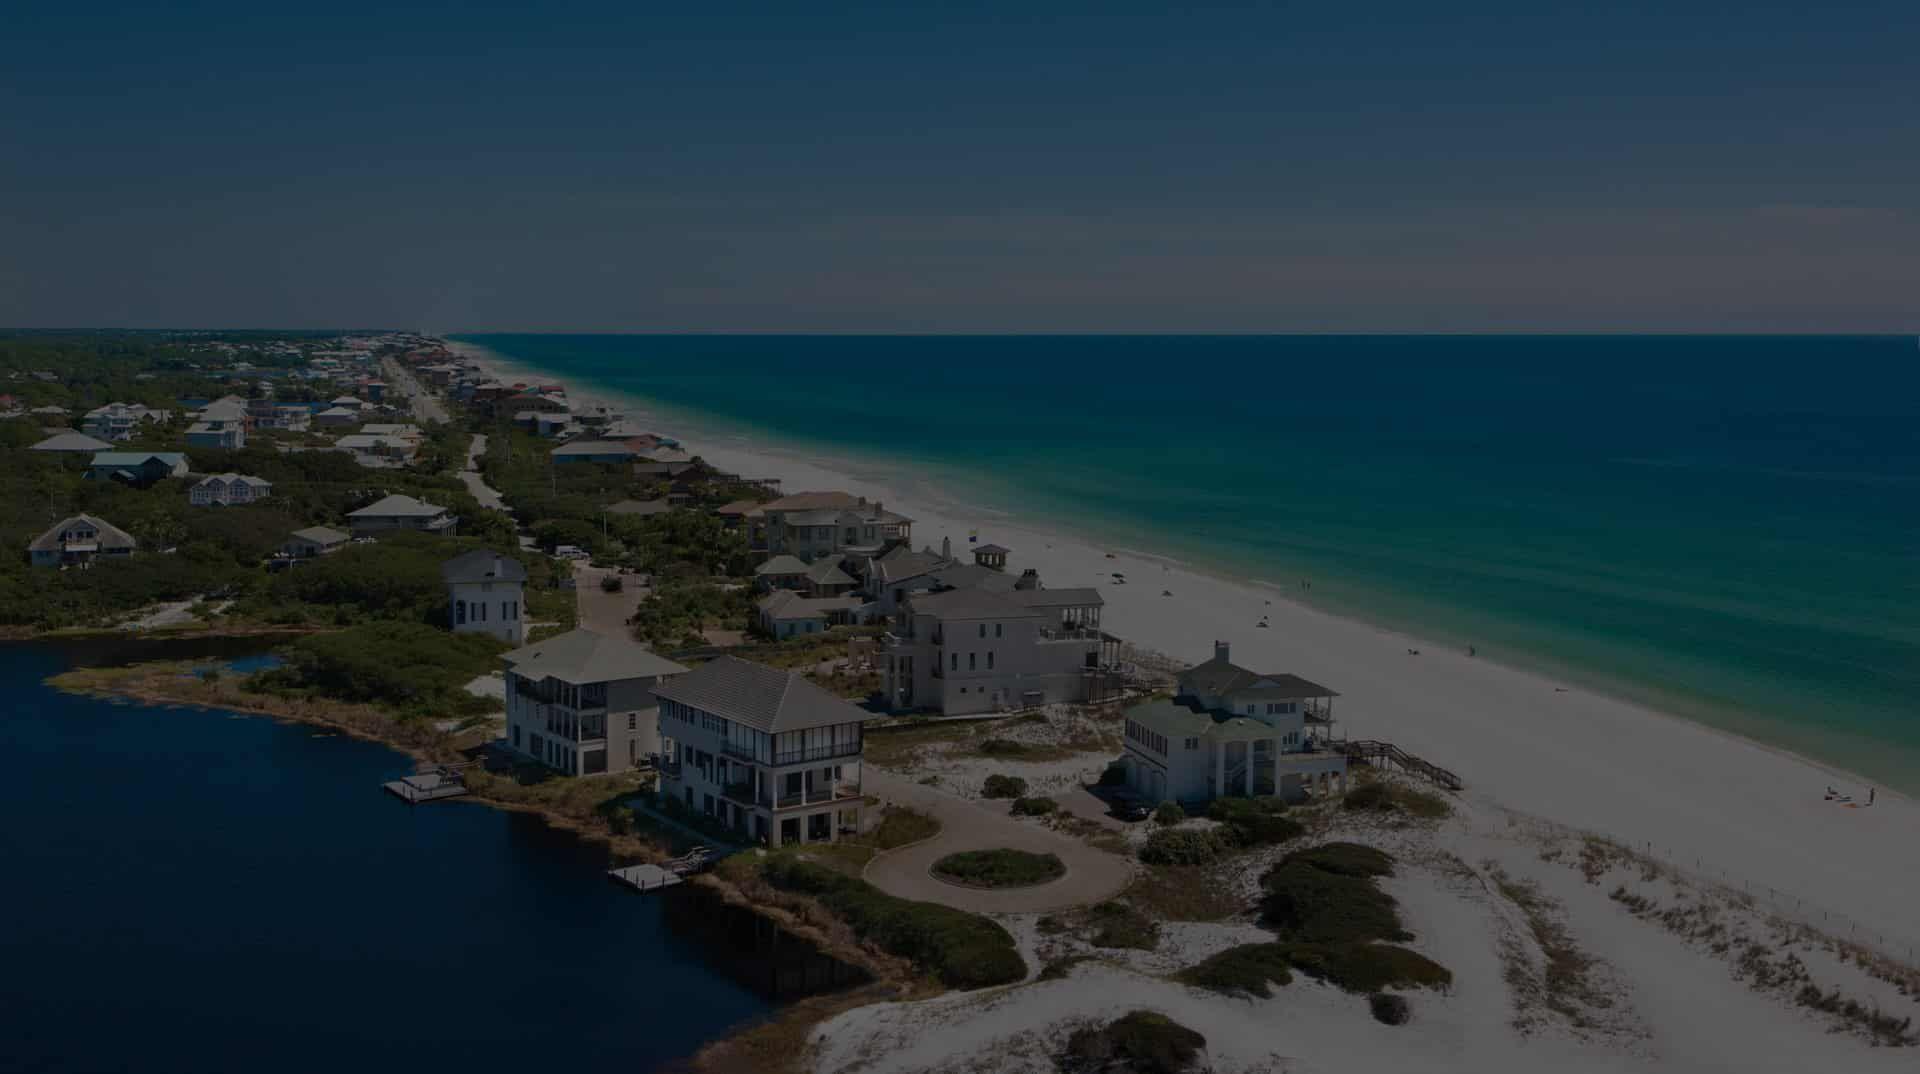 30a beach, 30a beach mortgage, 30a beach mortgage rates, 30a beach mortgage broker, 30a beach mortgage lender, 30a mortgage calculator mortgage broker near me,